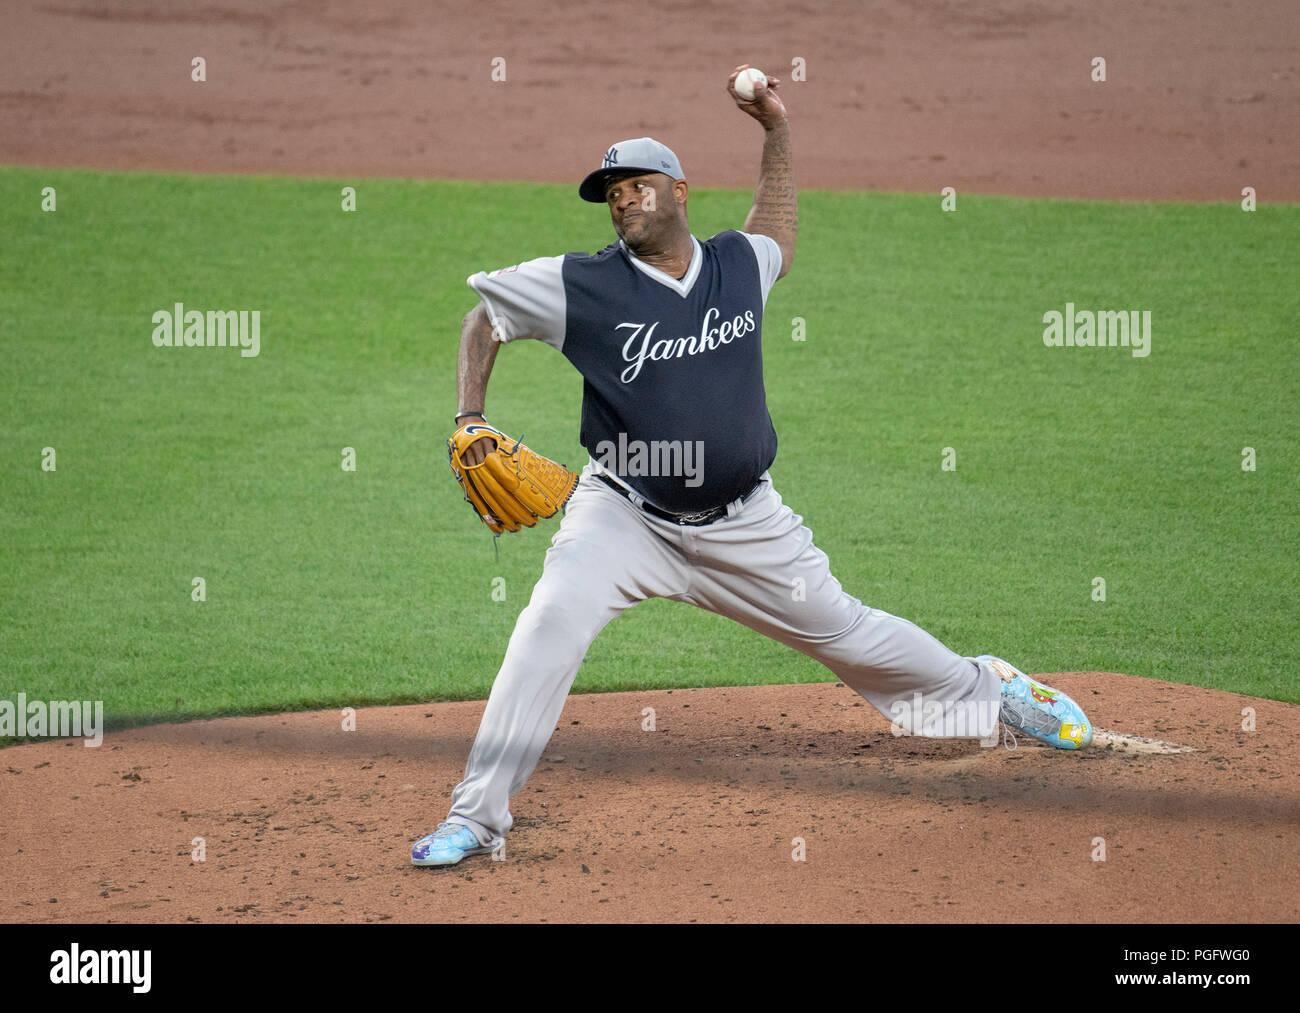 1223fe4b9 New York Yankees Cc Sabathia Stock Photos   New York Yankees Cc ...